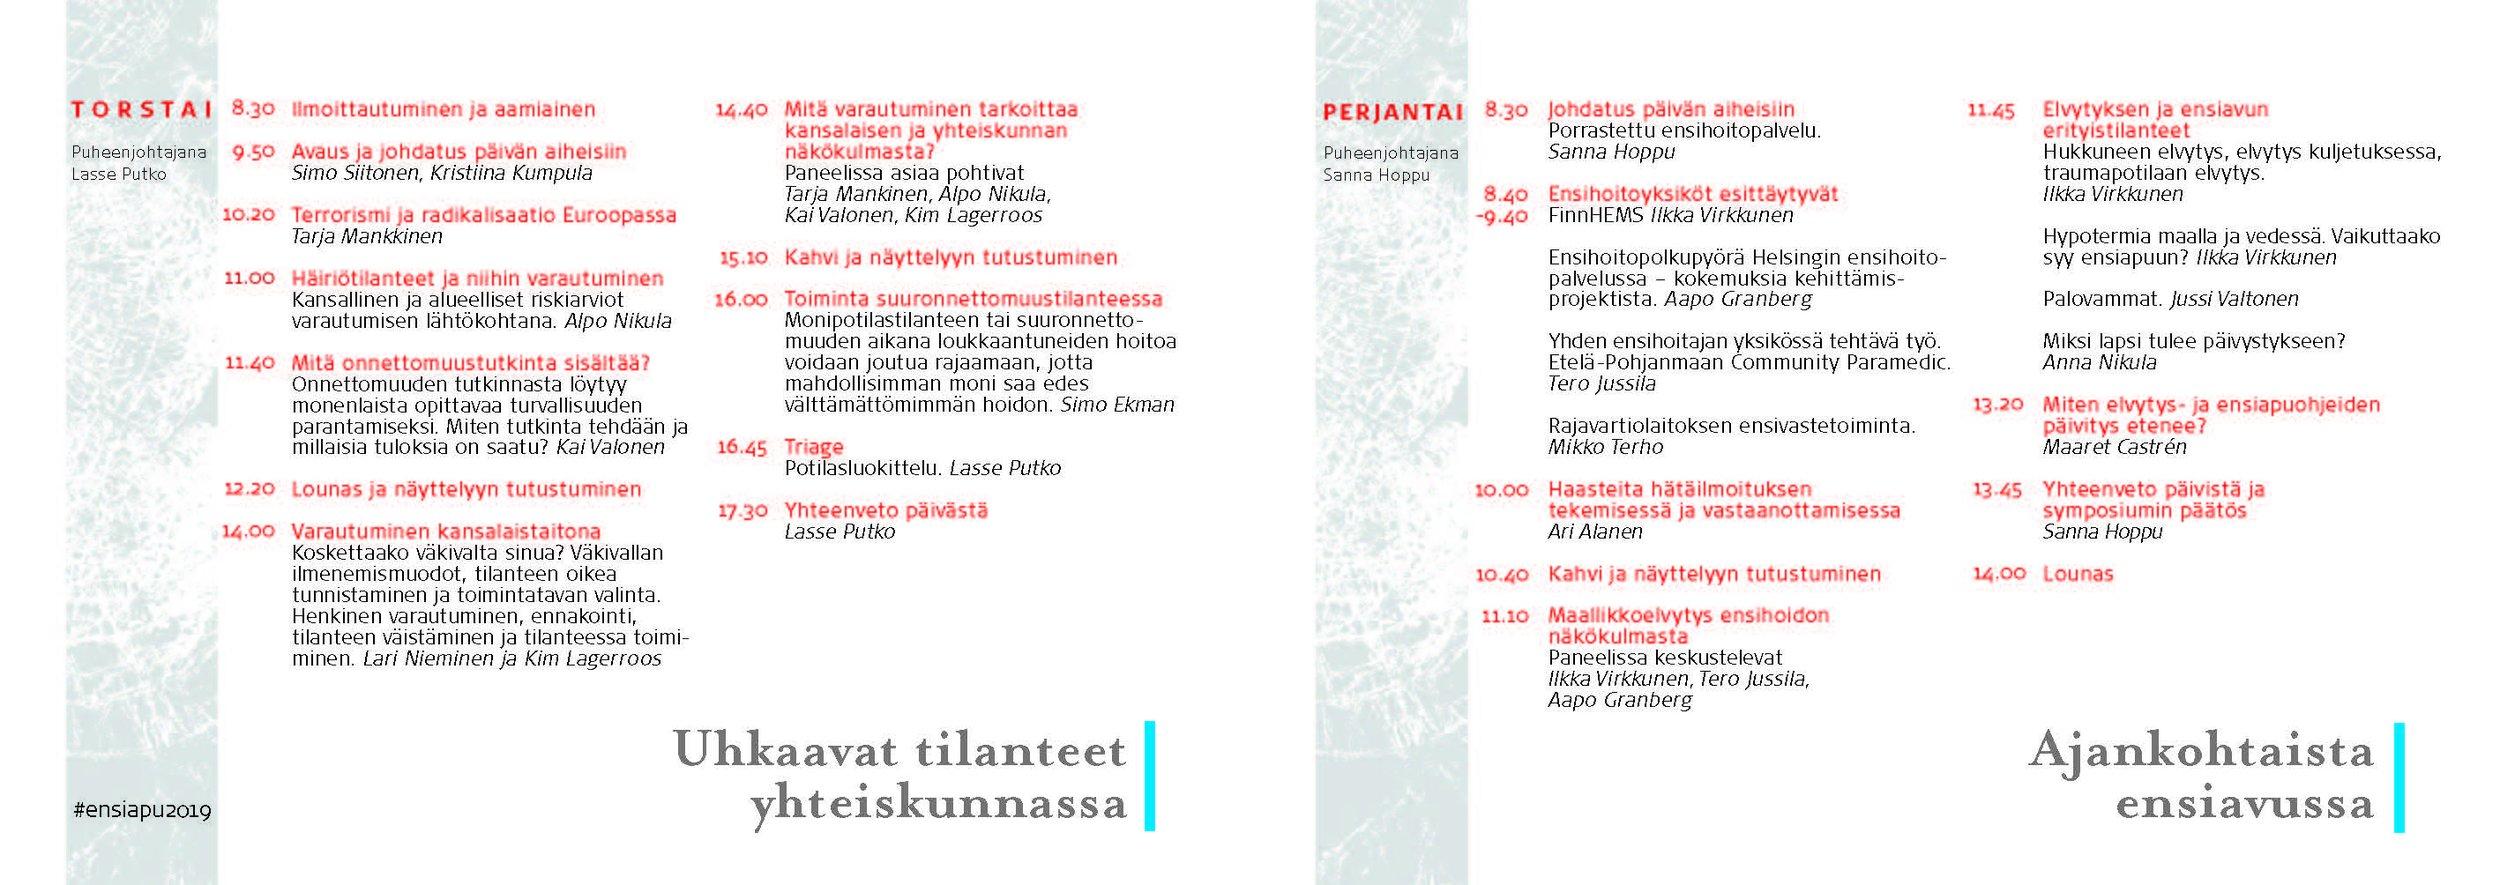 Symposium ohjelma 2019_Page_3.jpg